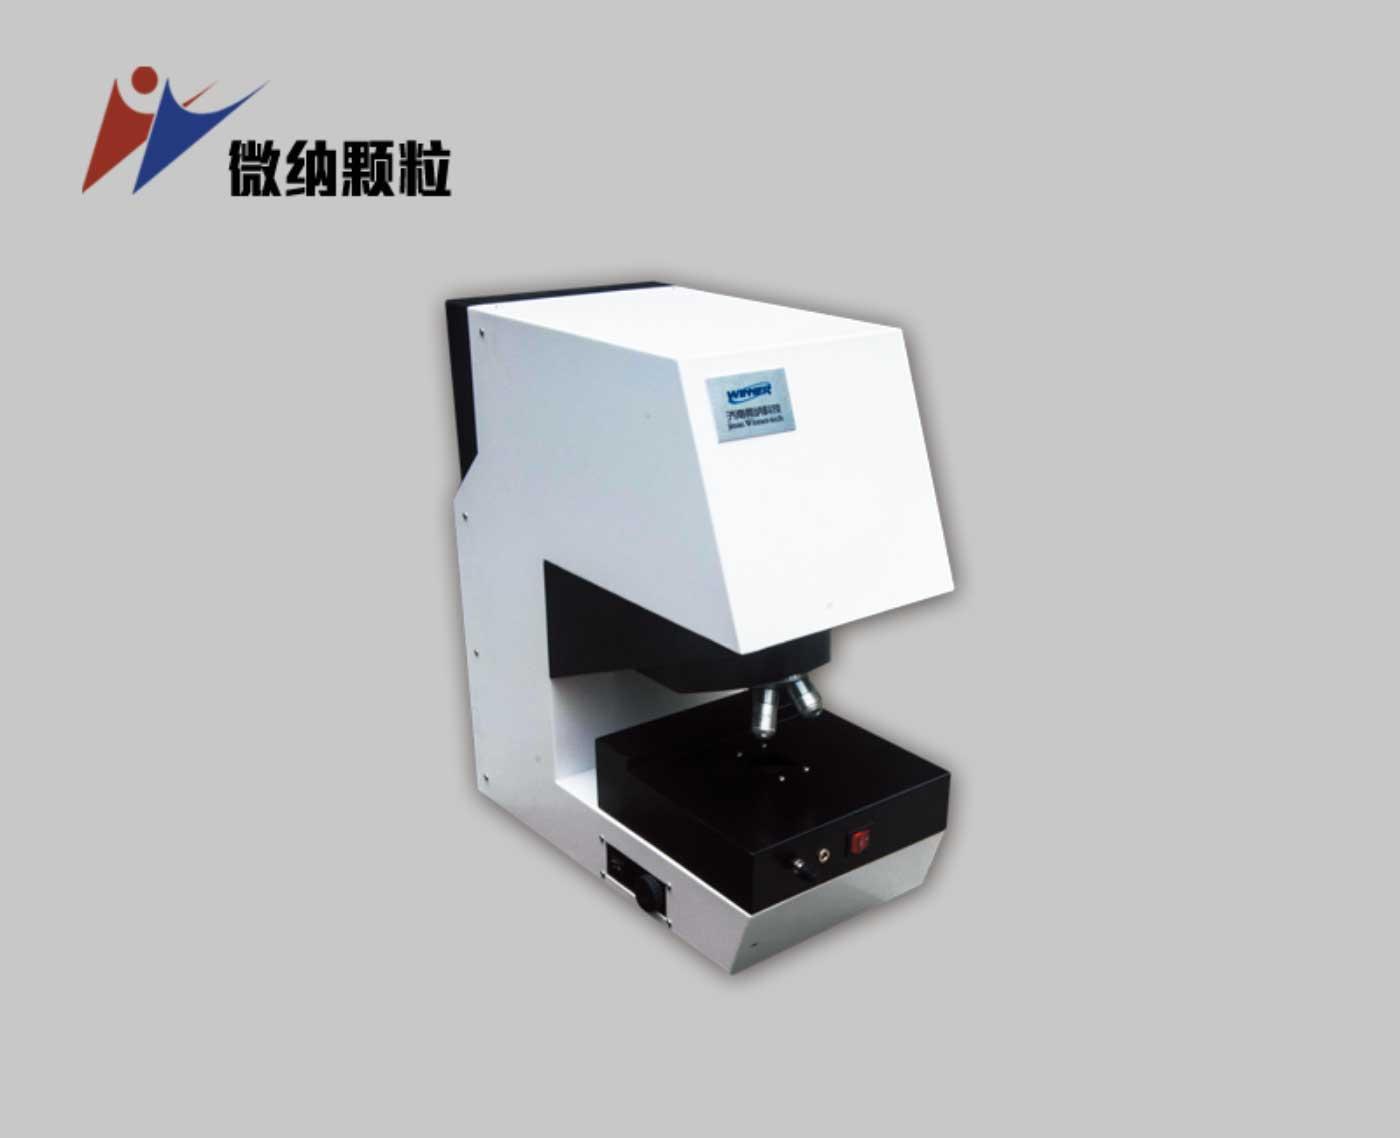 WINNER219全自动颗粒图像仪/颗粒图像分析仪的图片